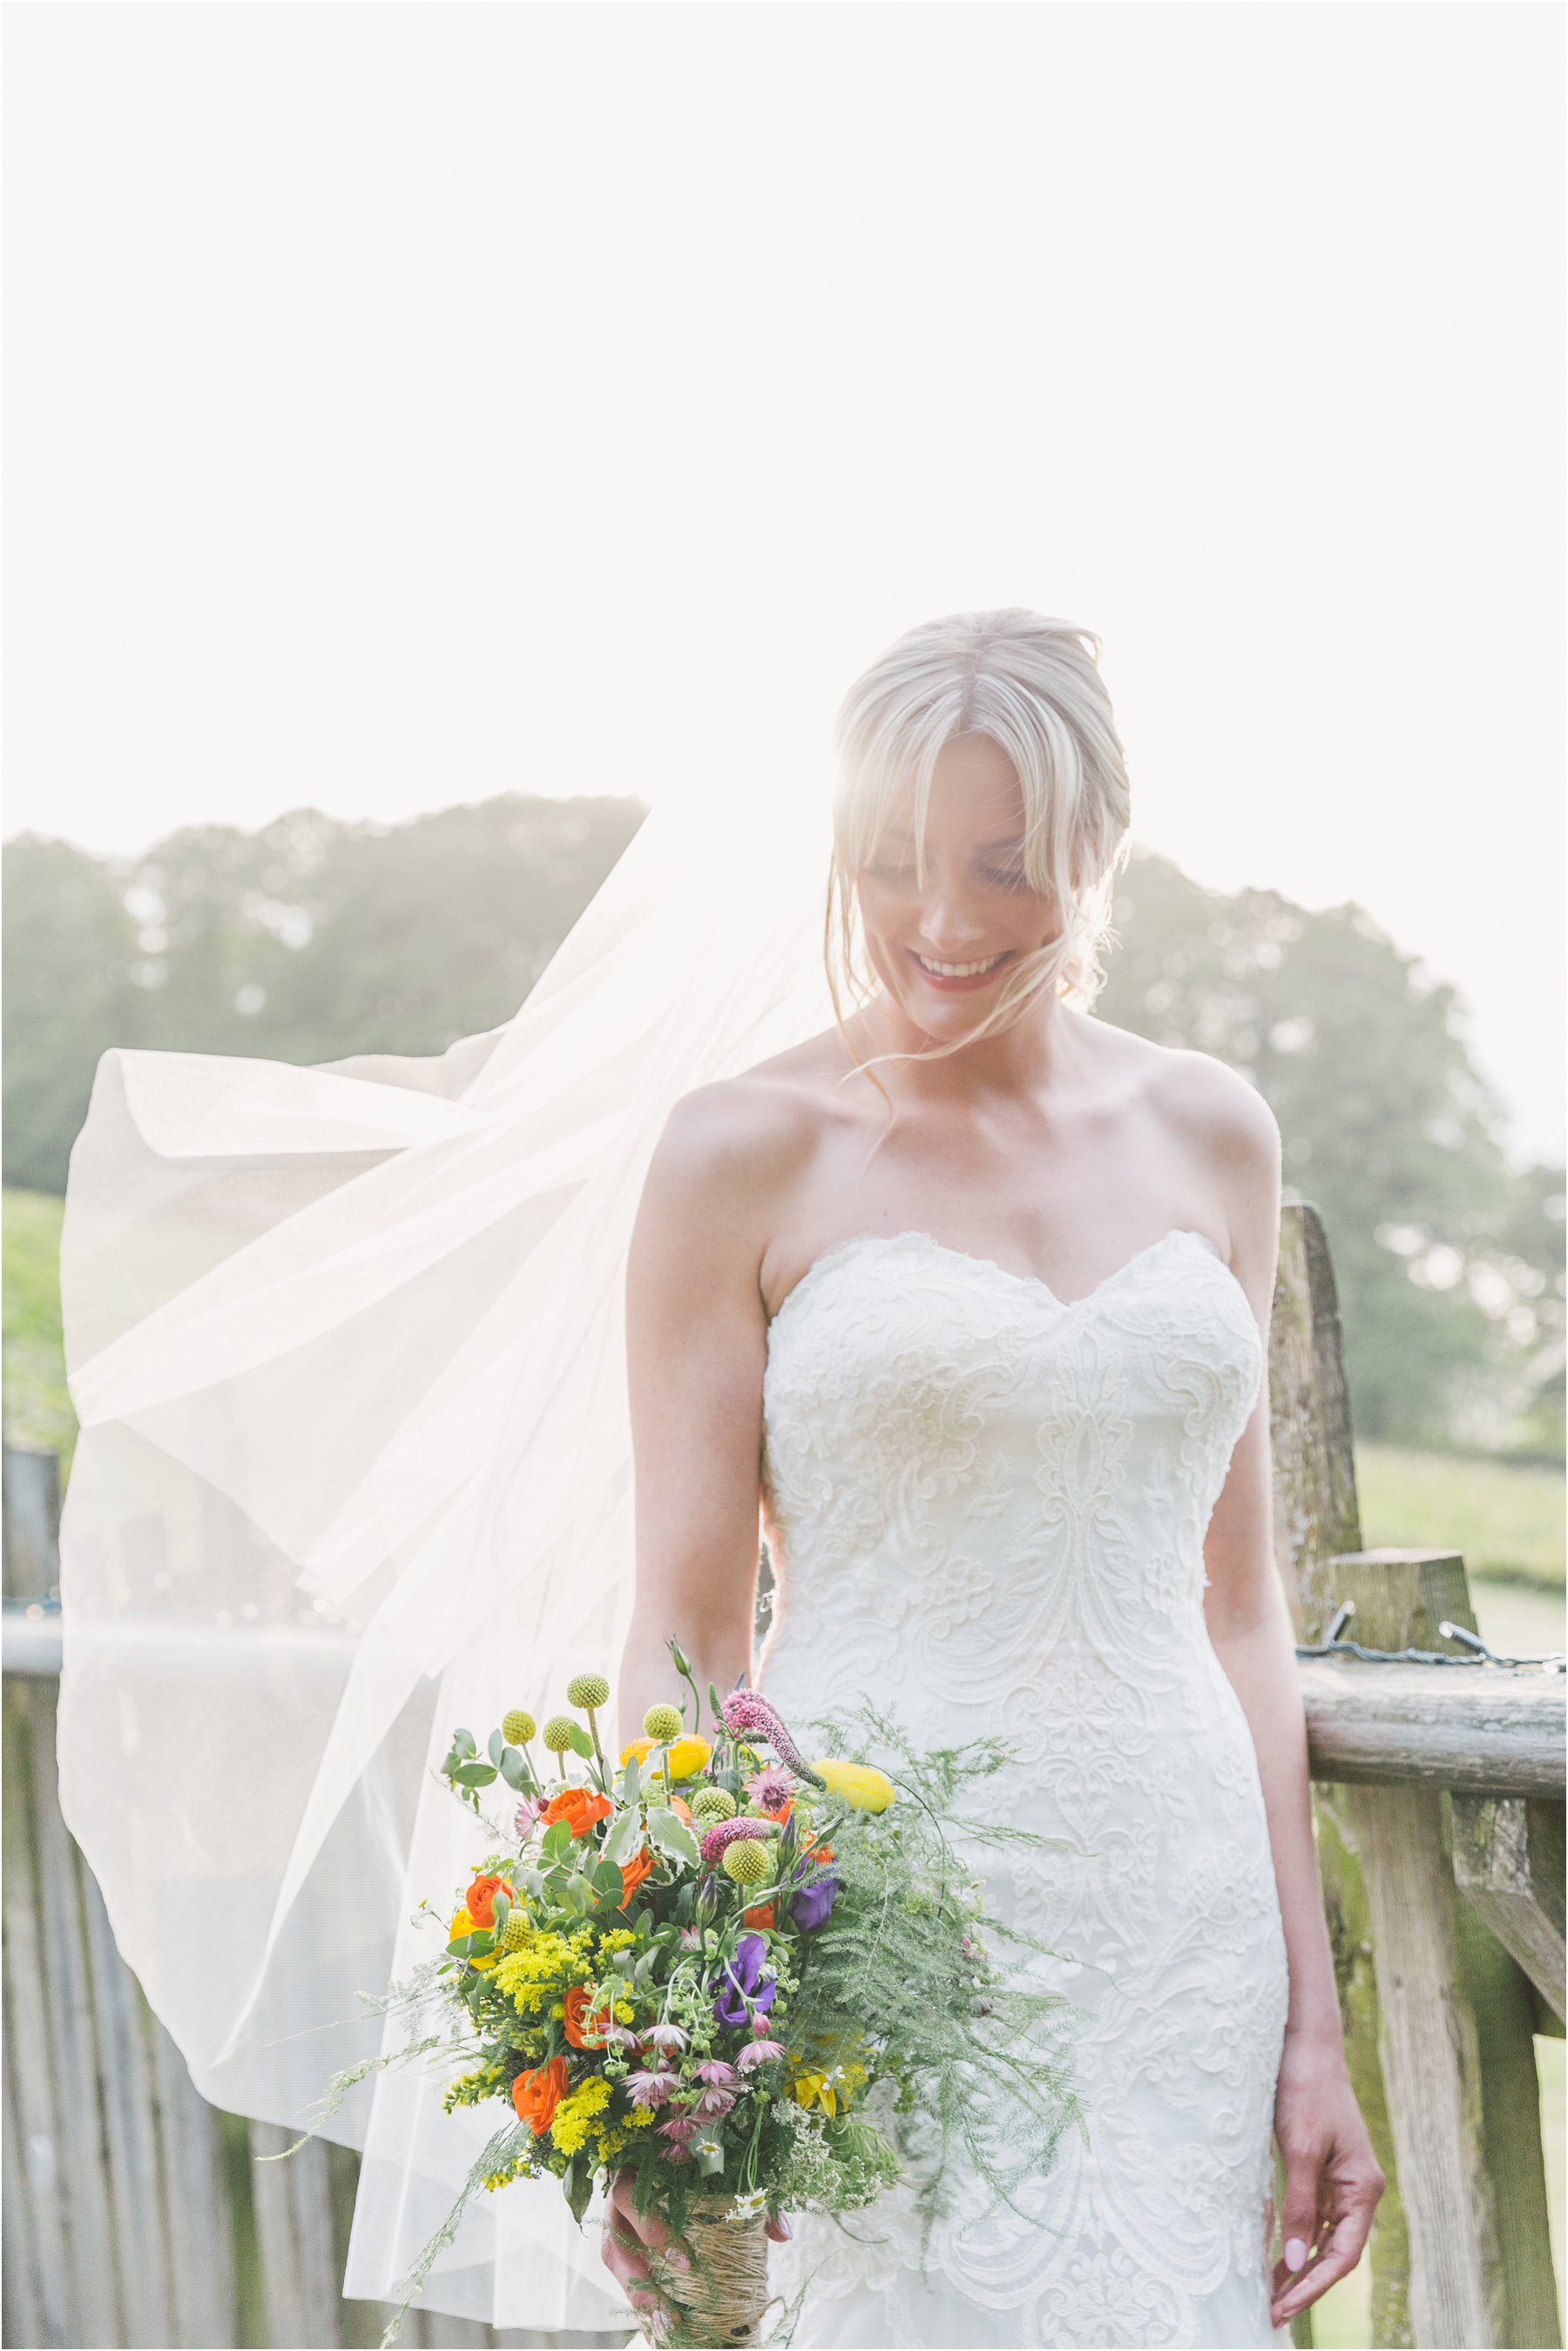 eve.photography.relaxed.creative.wedding.destination._0295.jpg